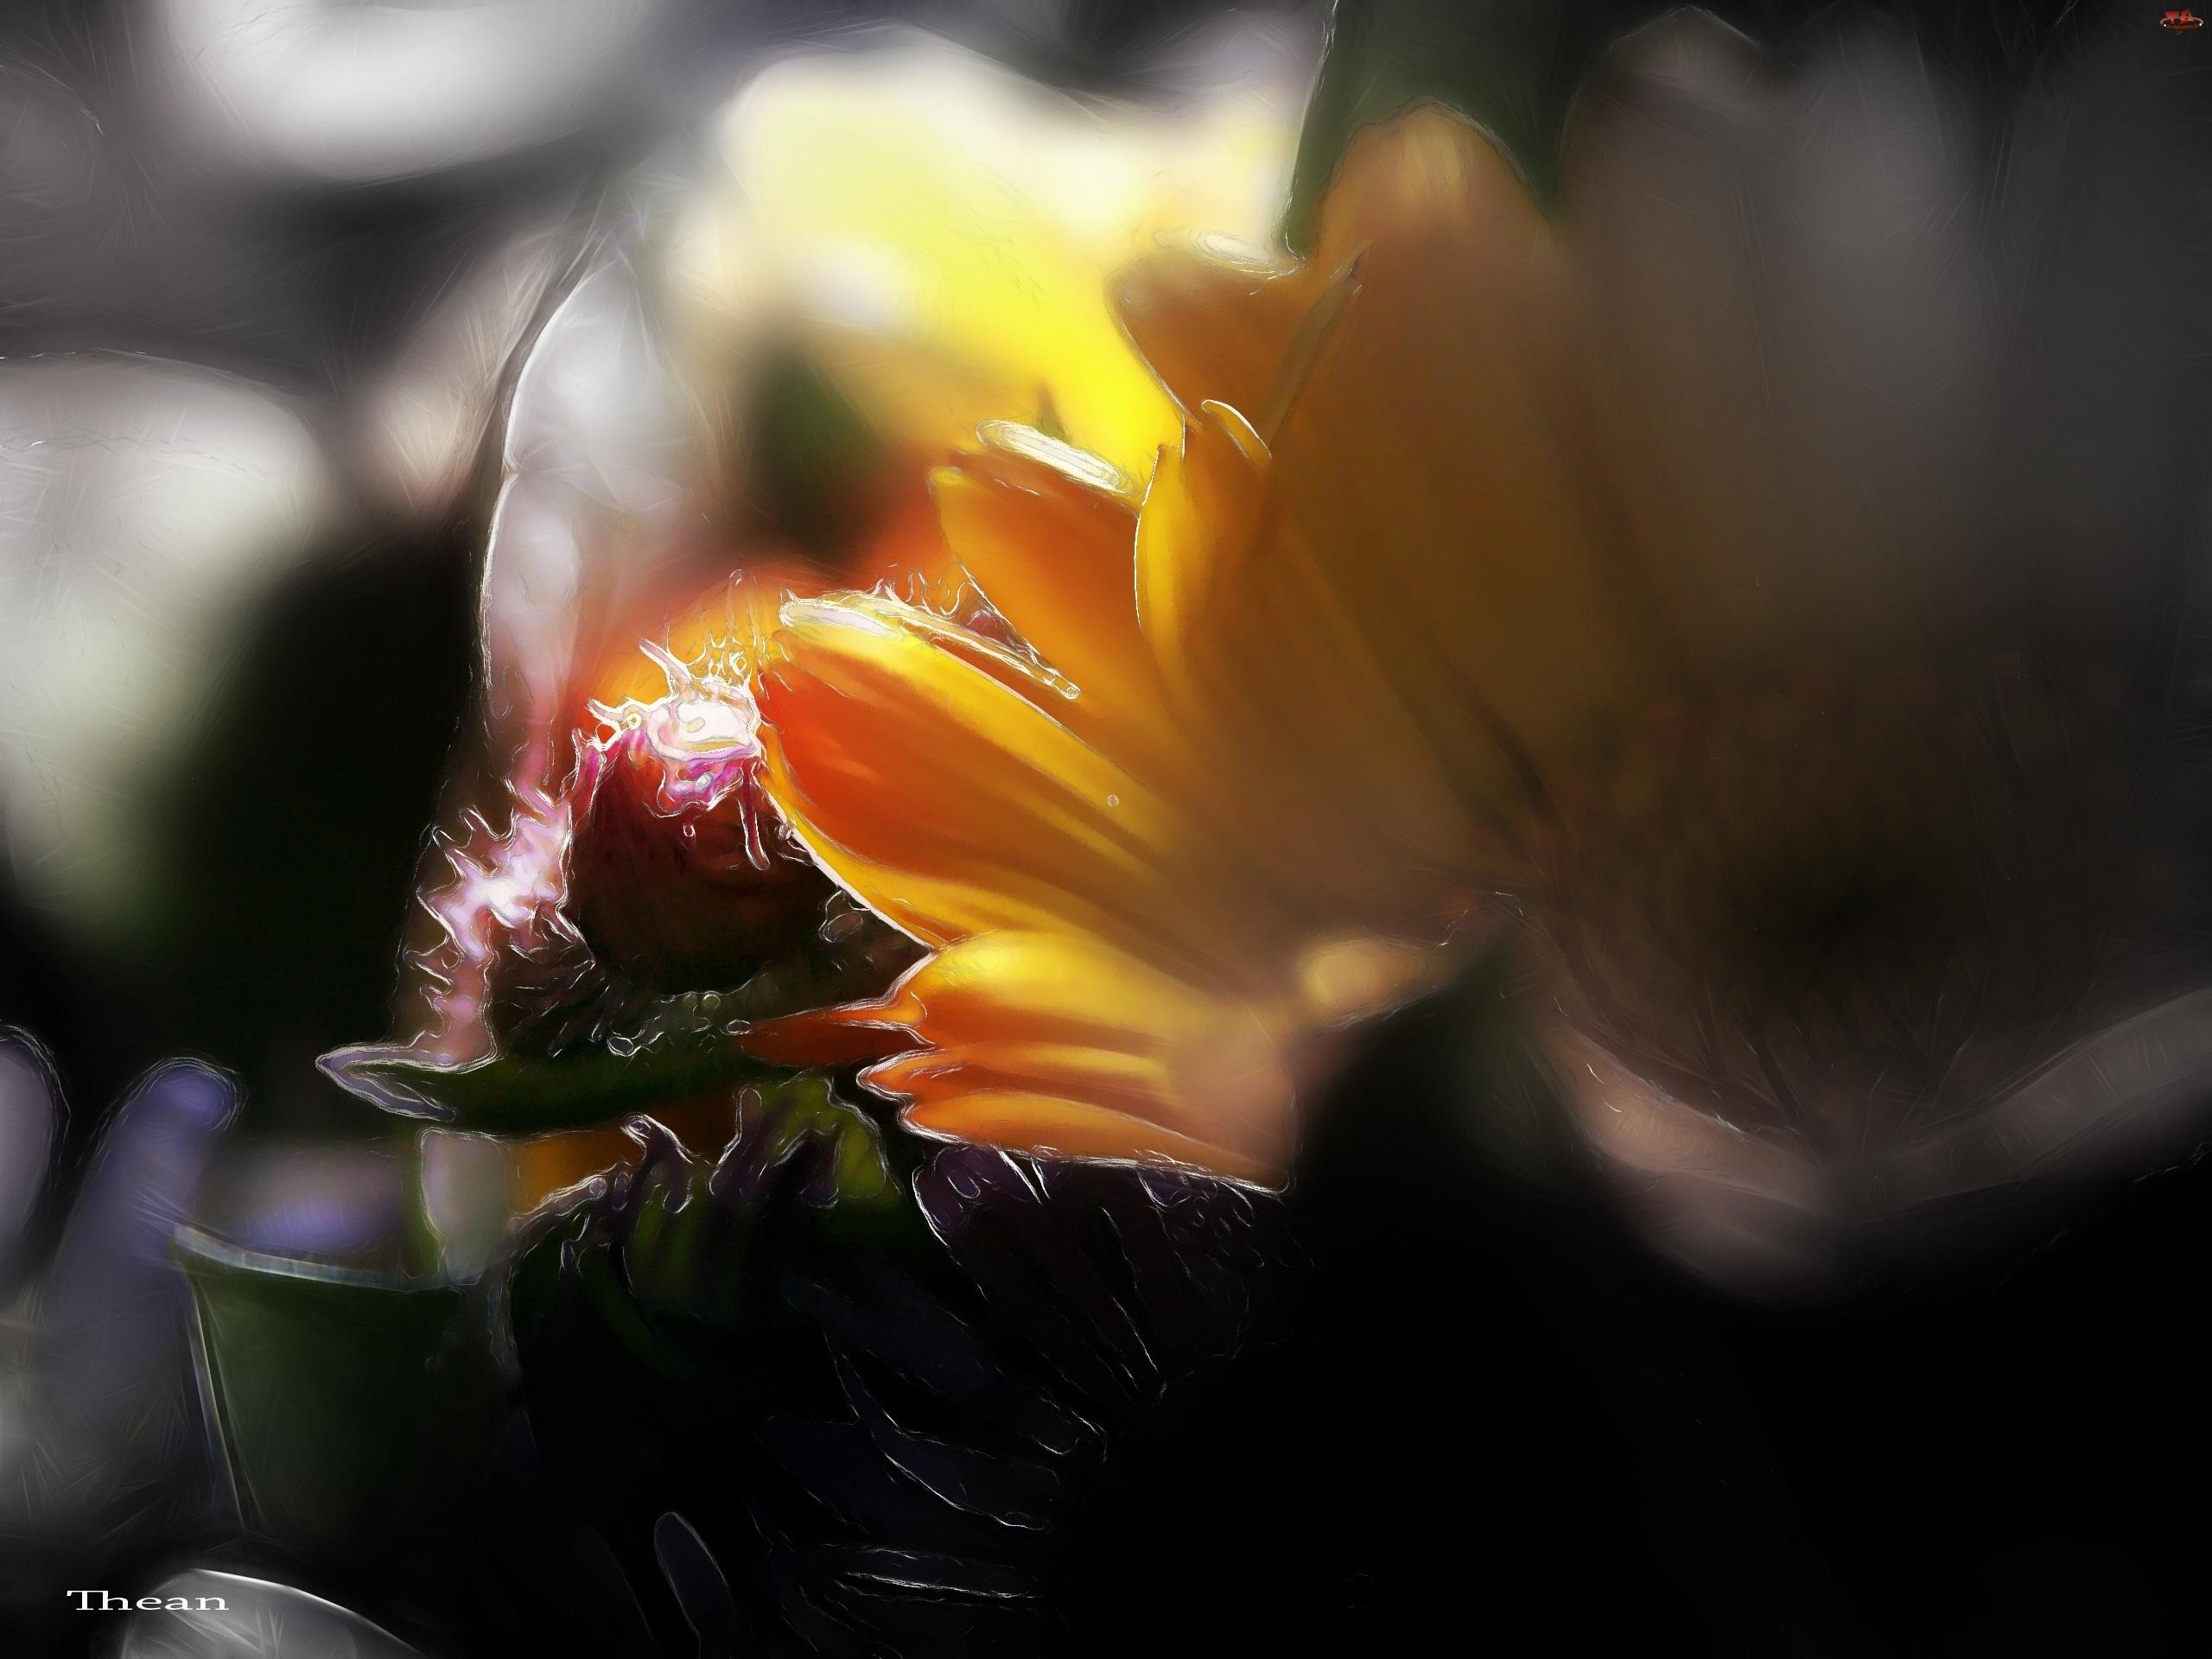 Fractalius, Kwiaty, Polne